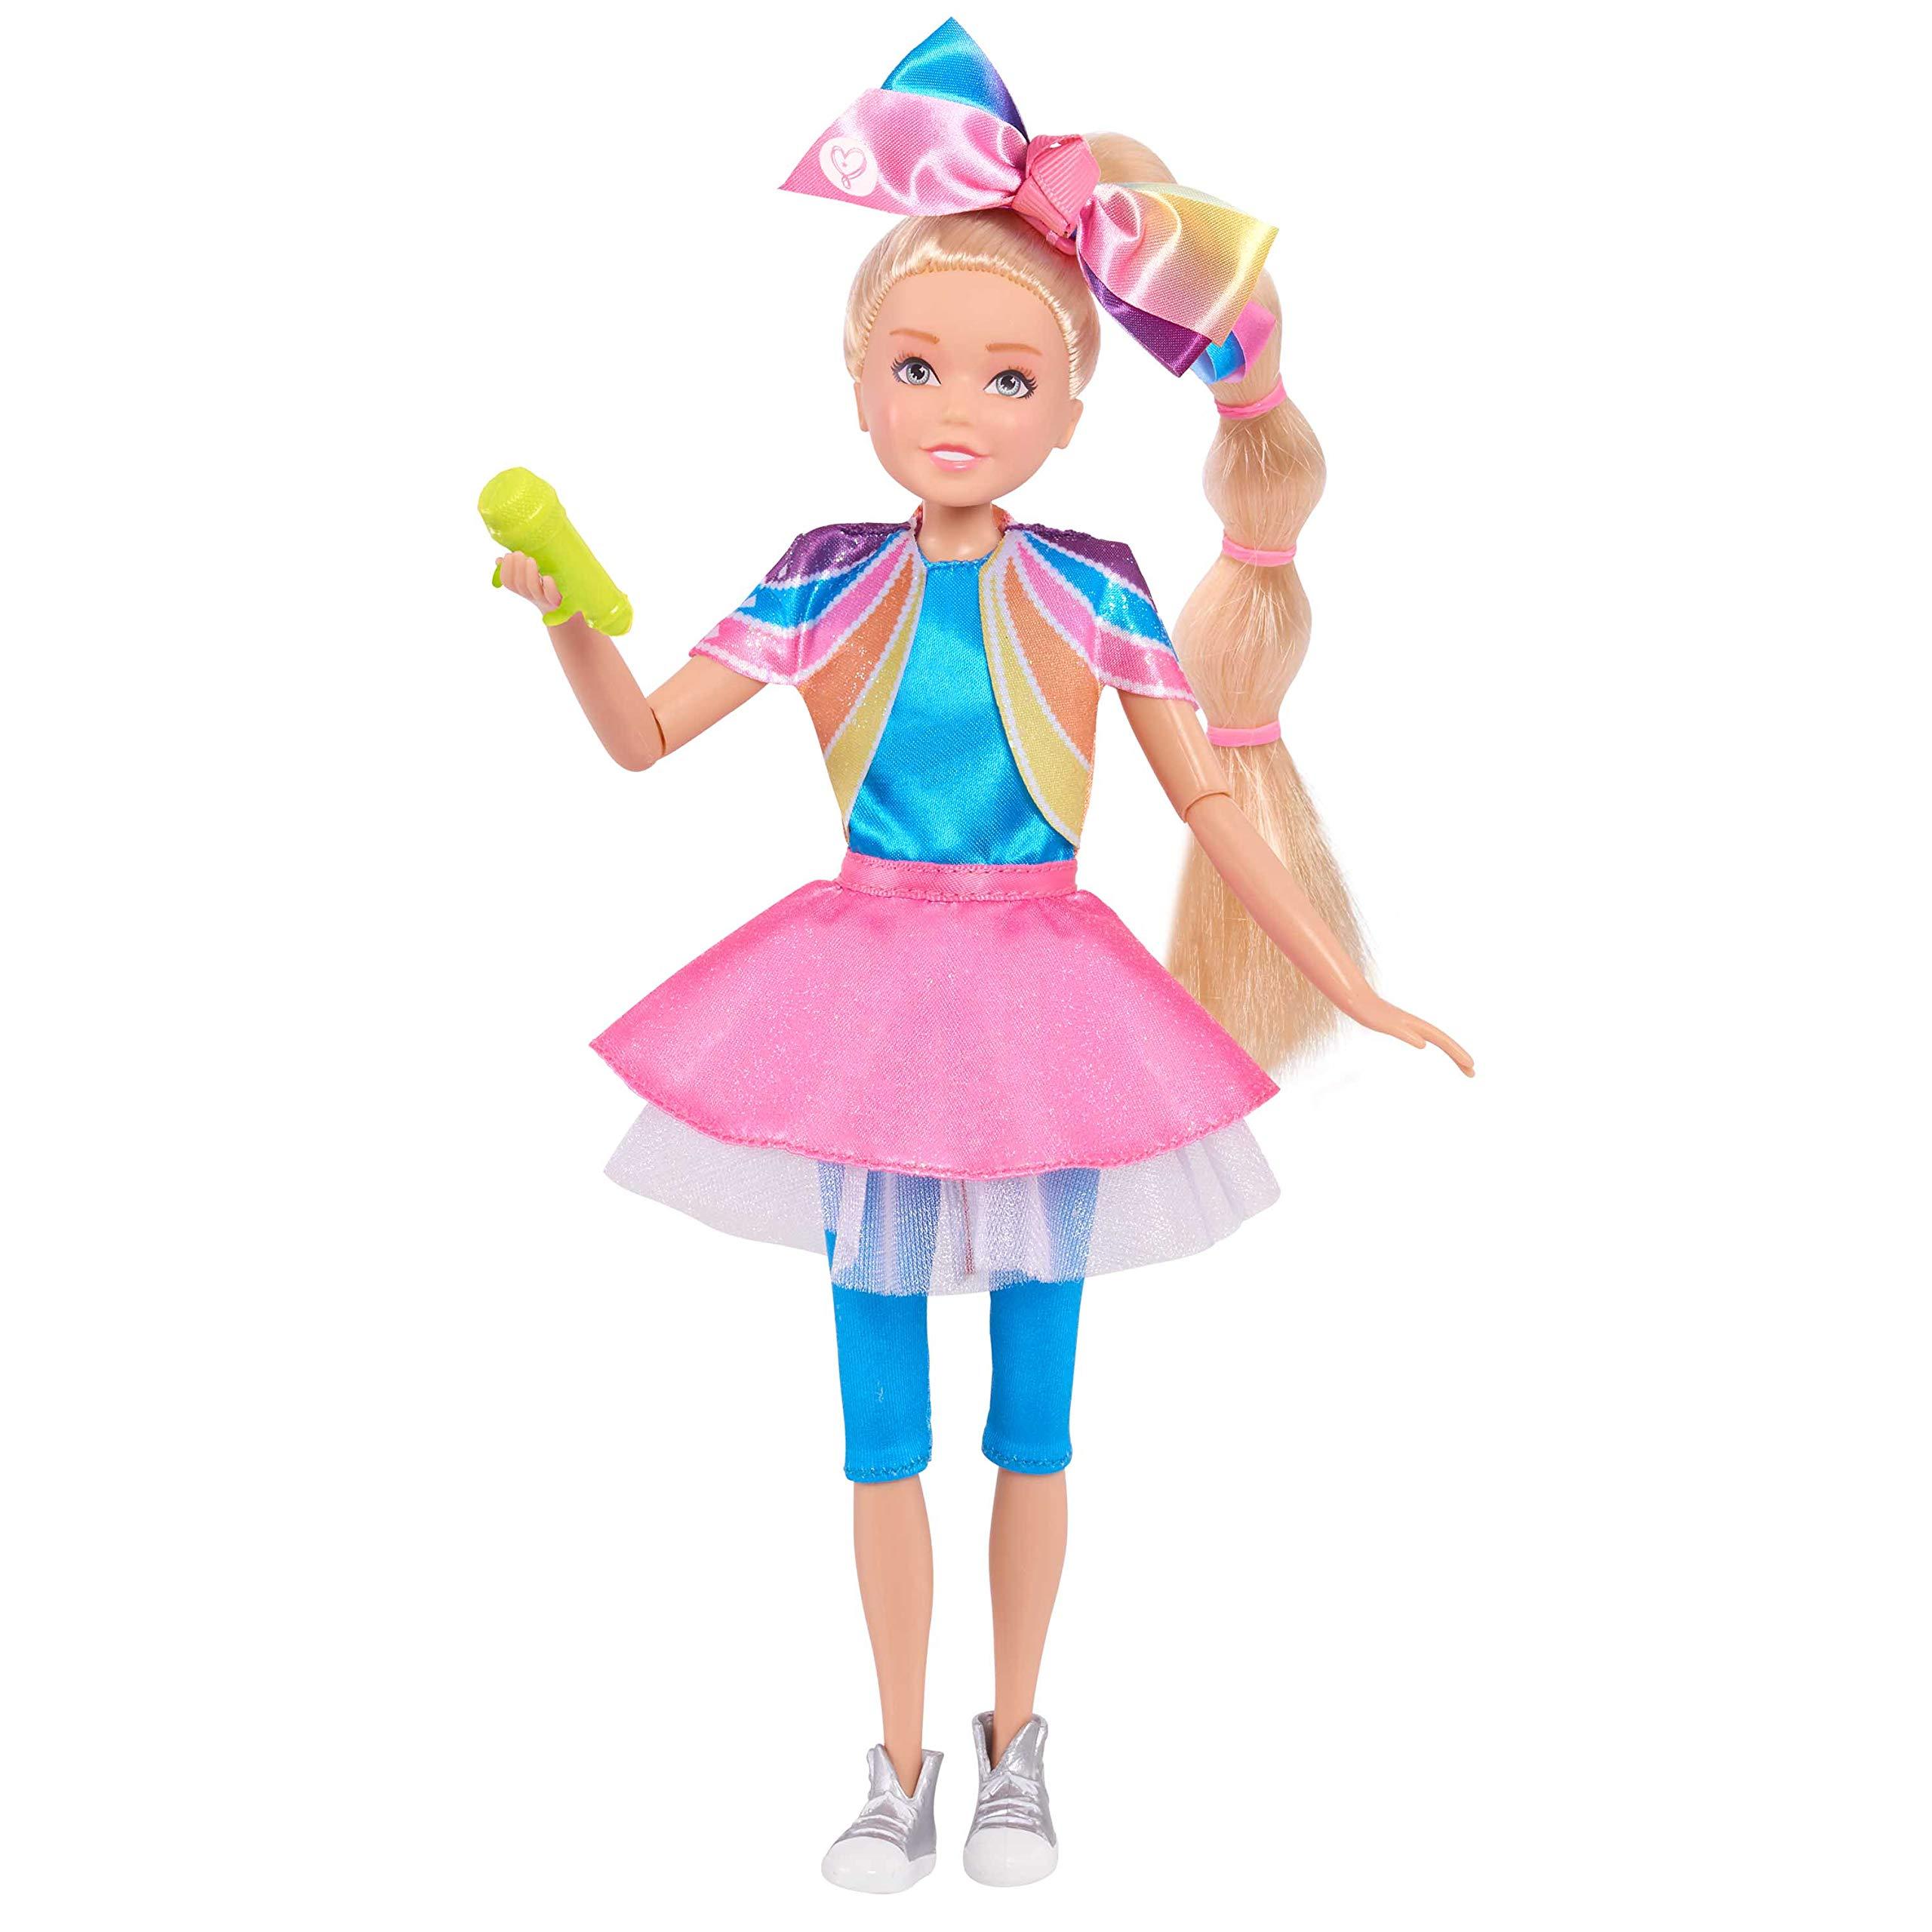 JoJo Siwa Singing JoJo Doll, It's Time to Celebrate